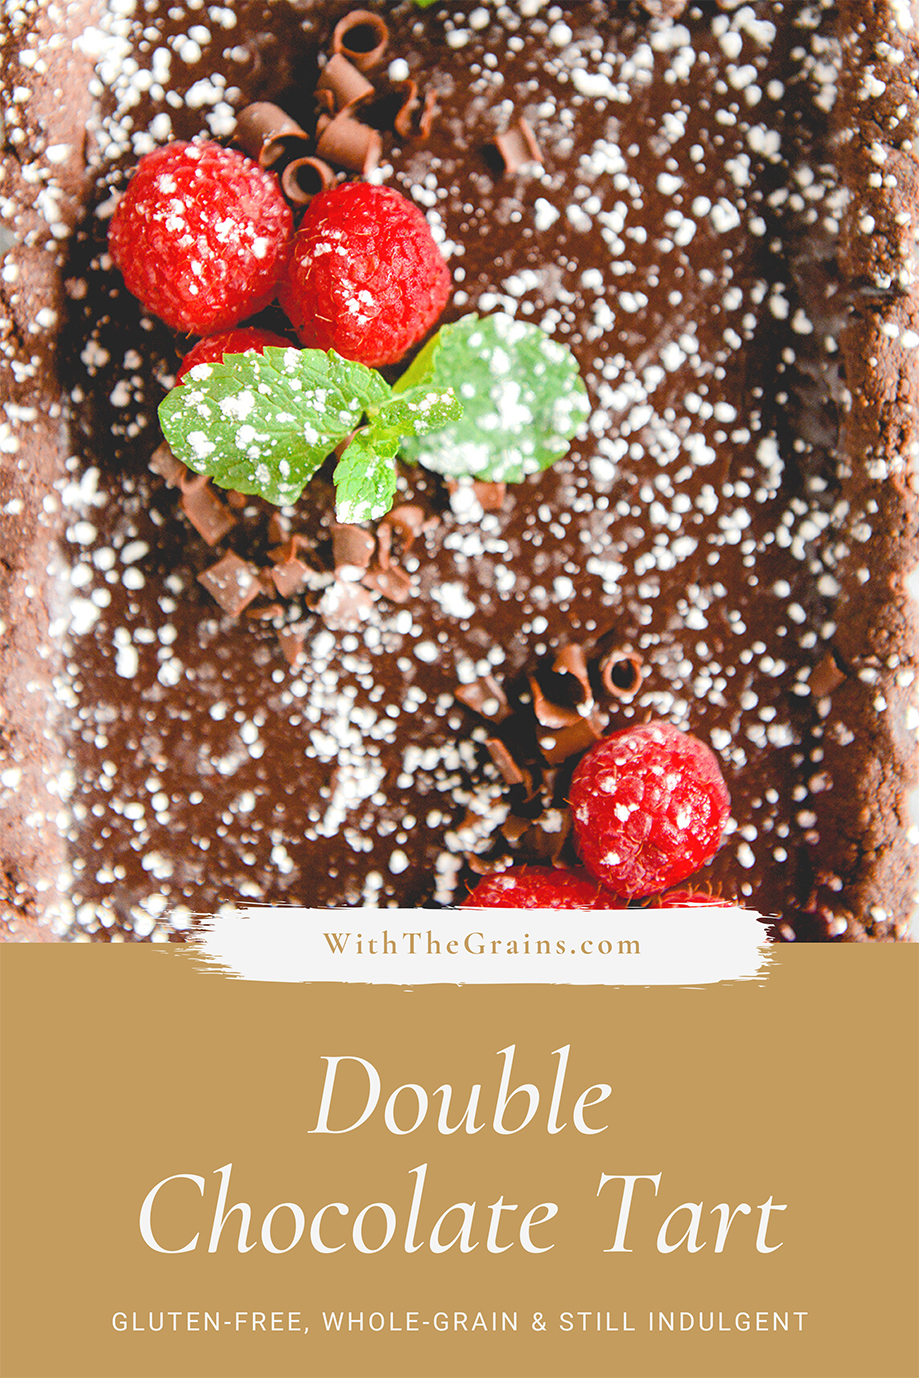 Double Chocolate Tart (Whole Grain & Gluten-Free) // www.WithTheGrains.com